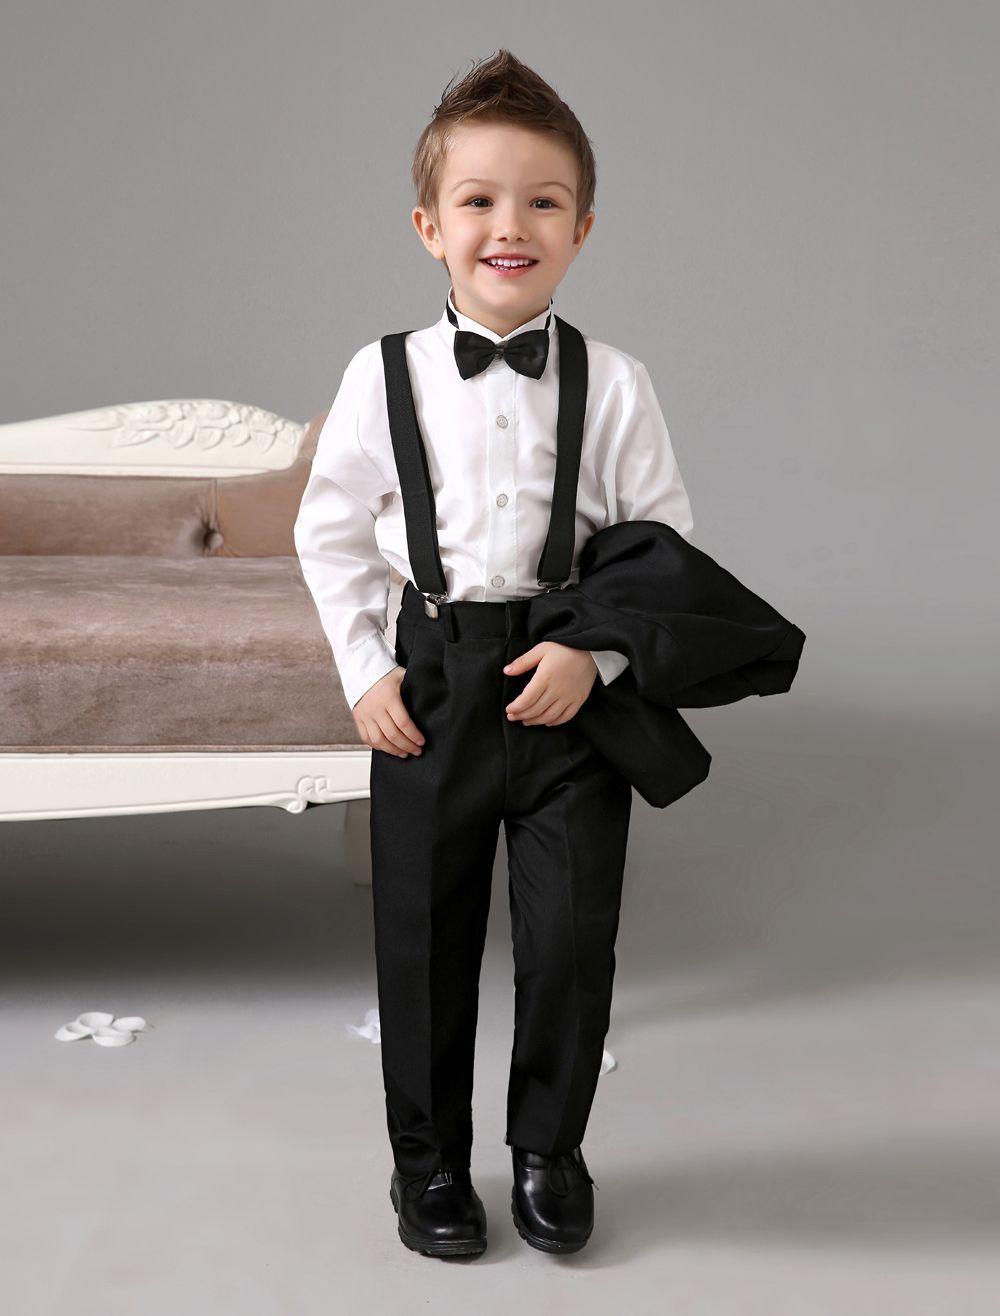 Boys Black Tie Dresses Dressesss